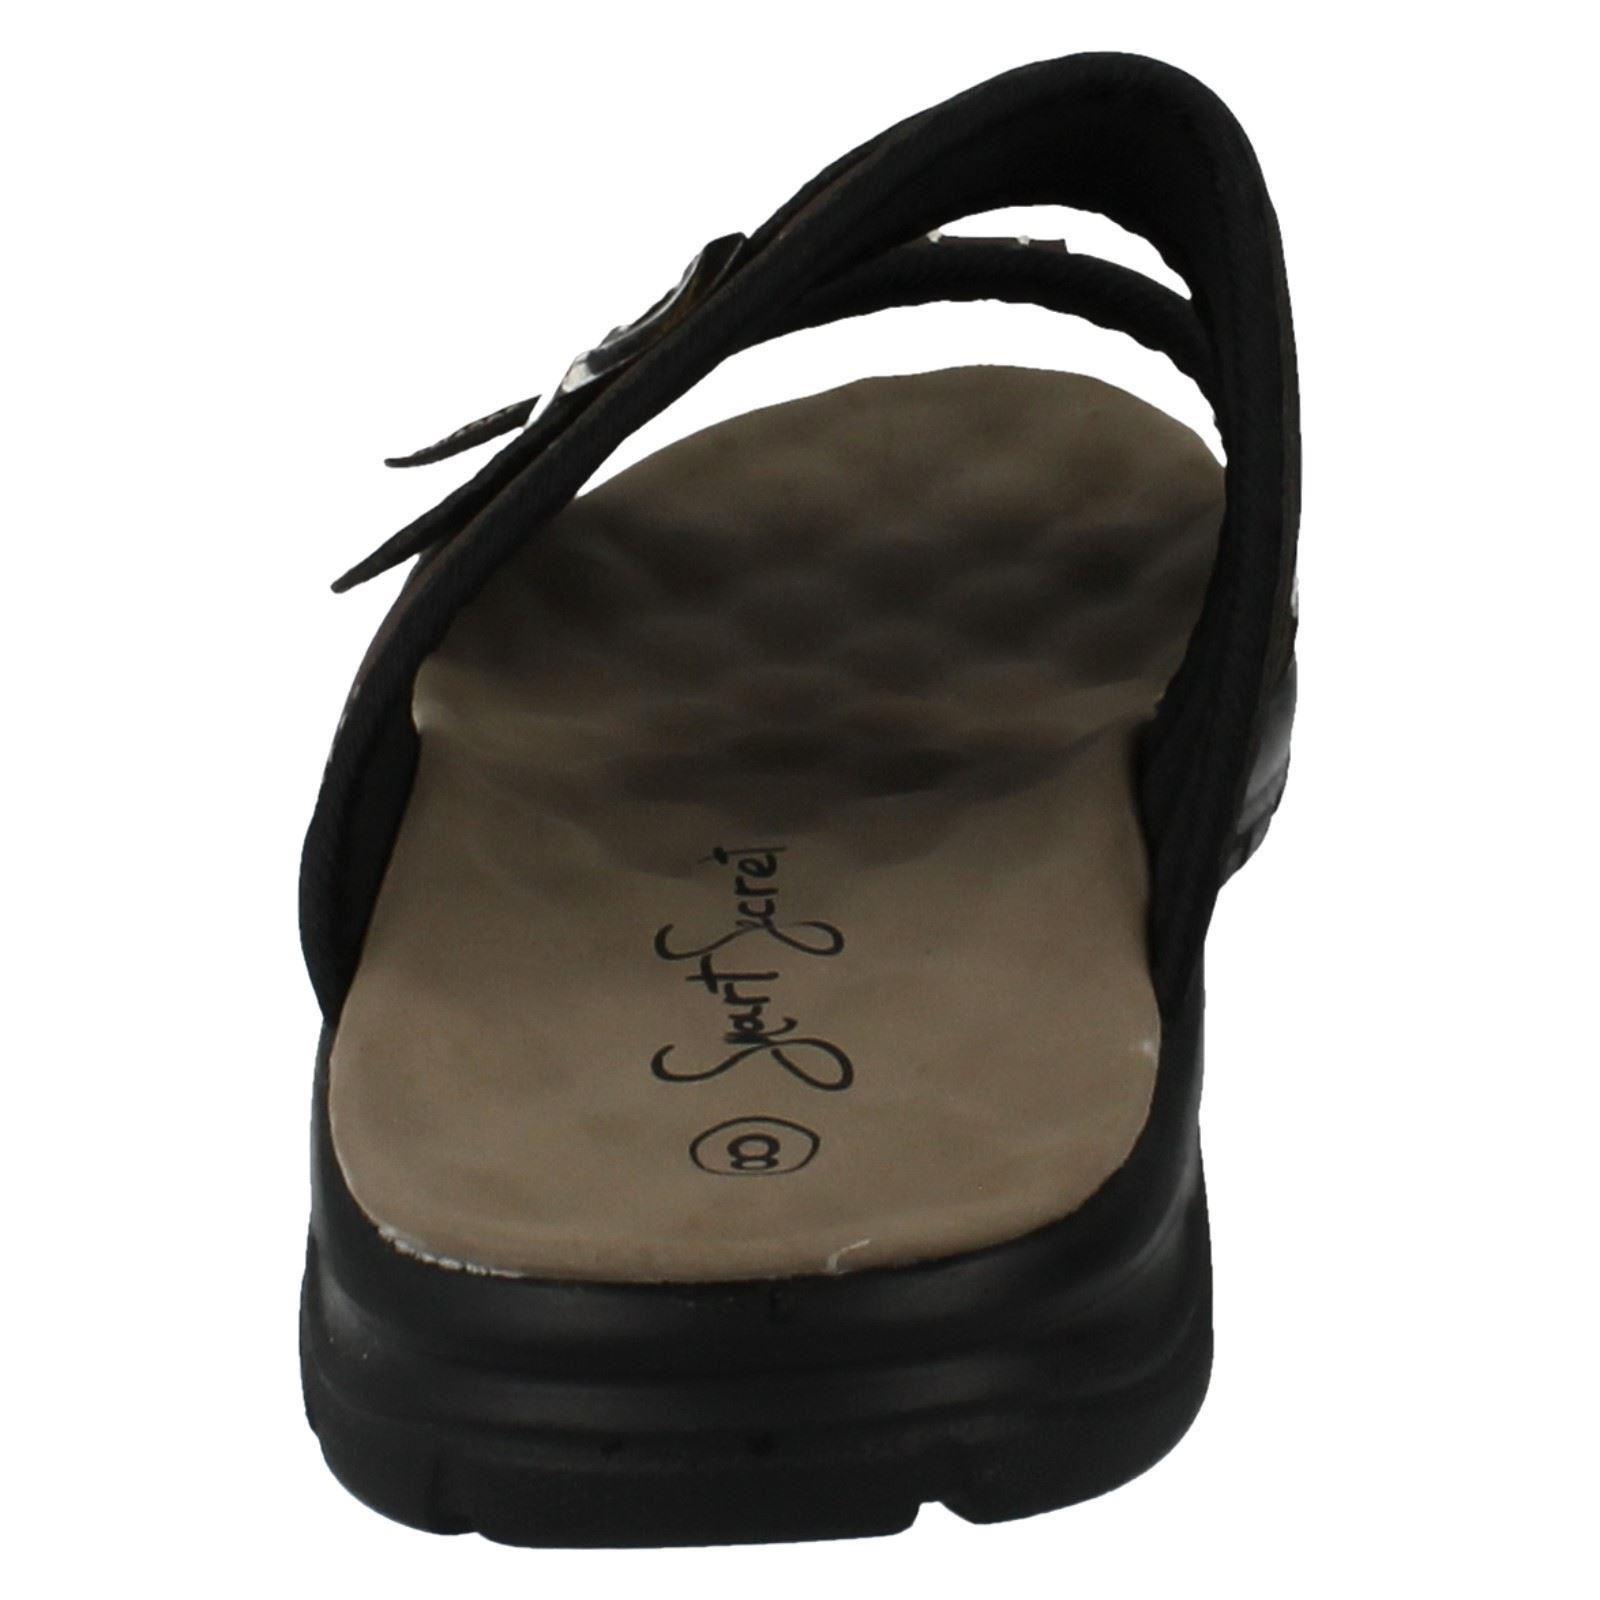 Para Hombre Smart Secret Casual Slip On Mula Sandalias el estilo-l5011